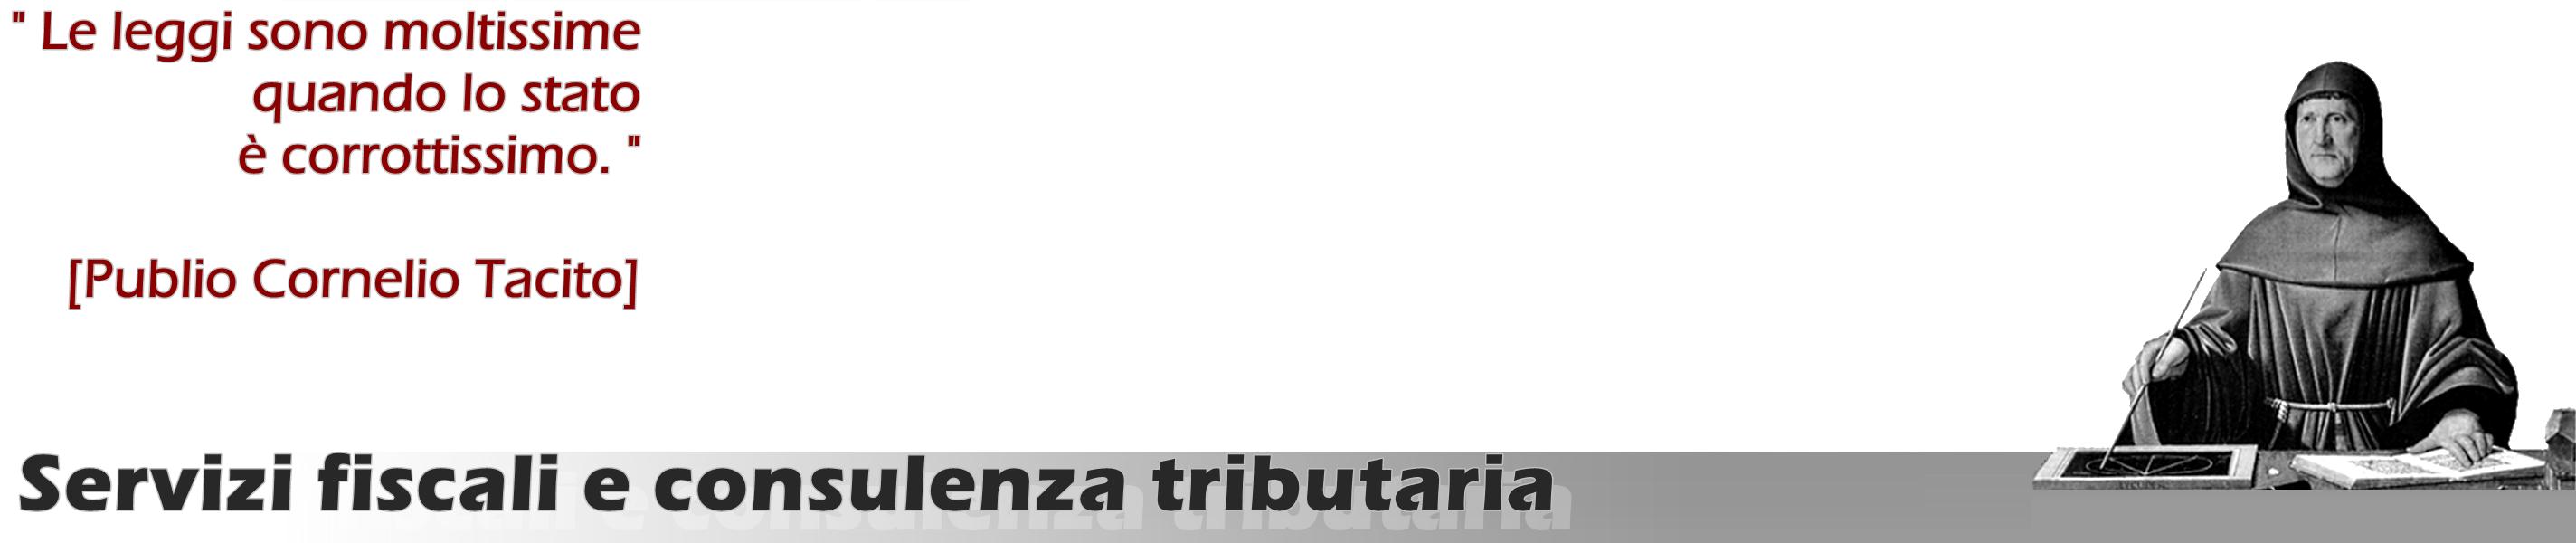 2-servizi-fiscali